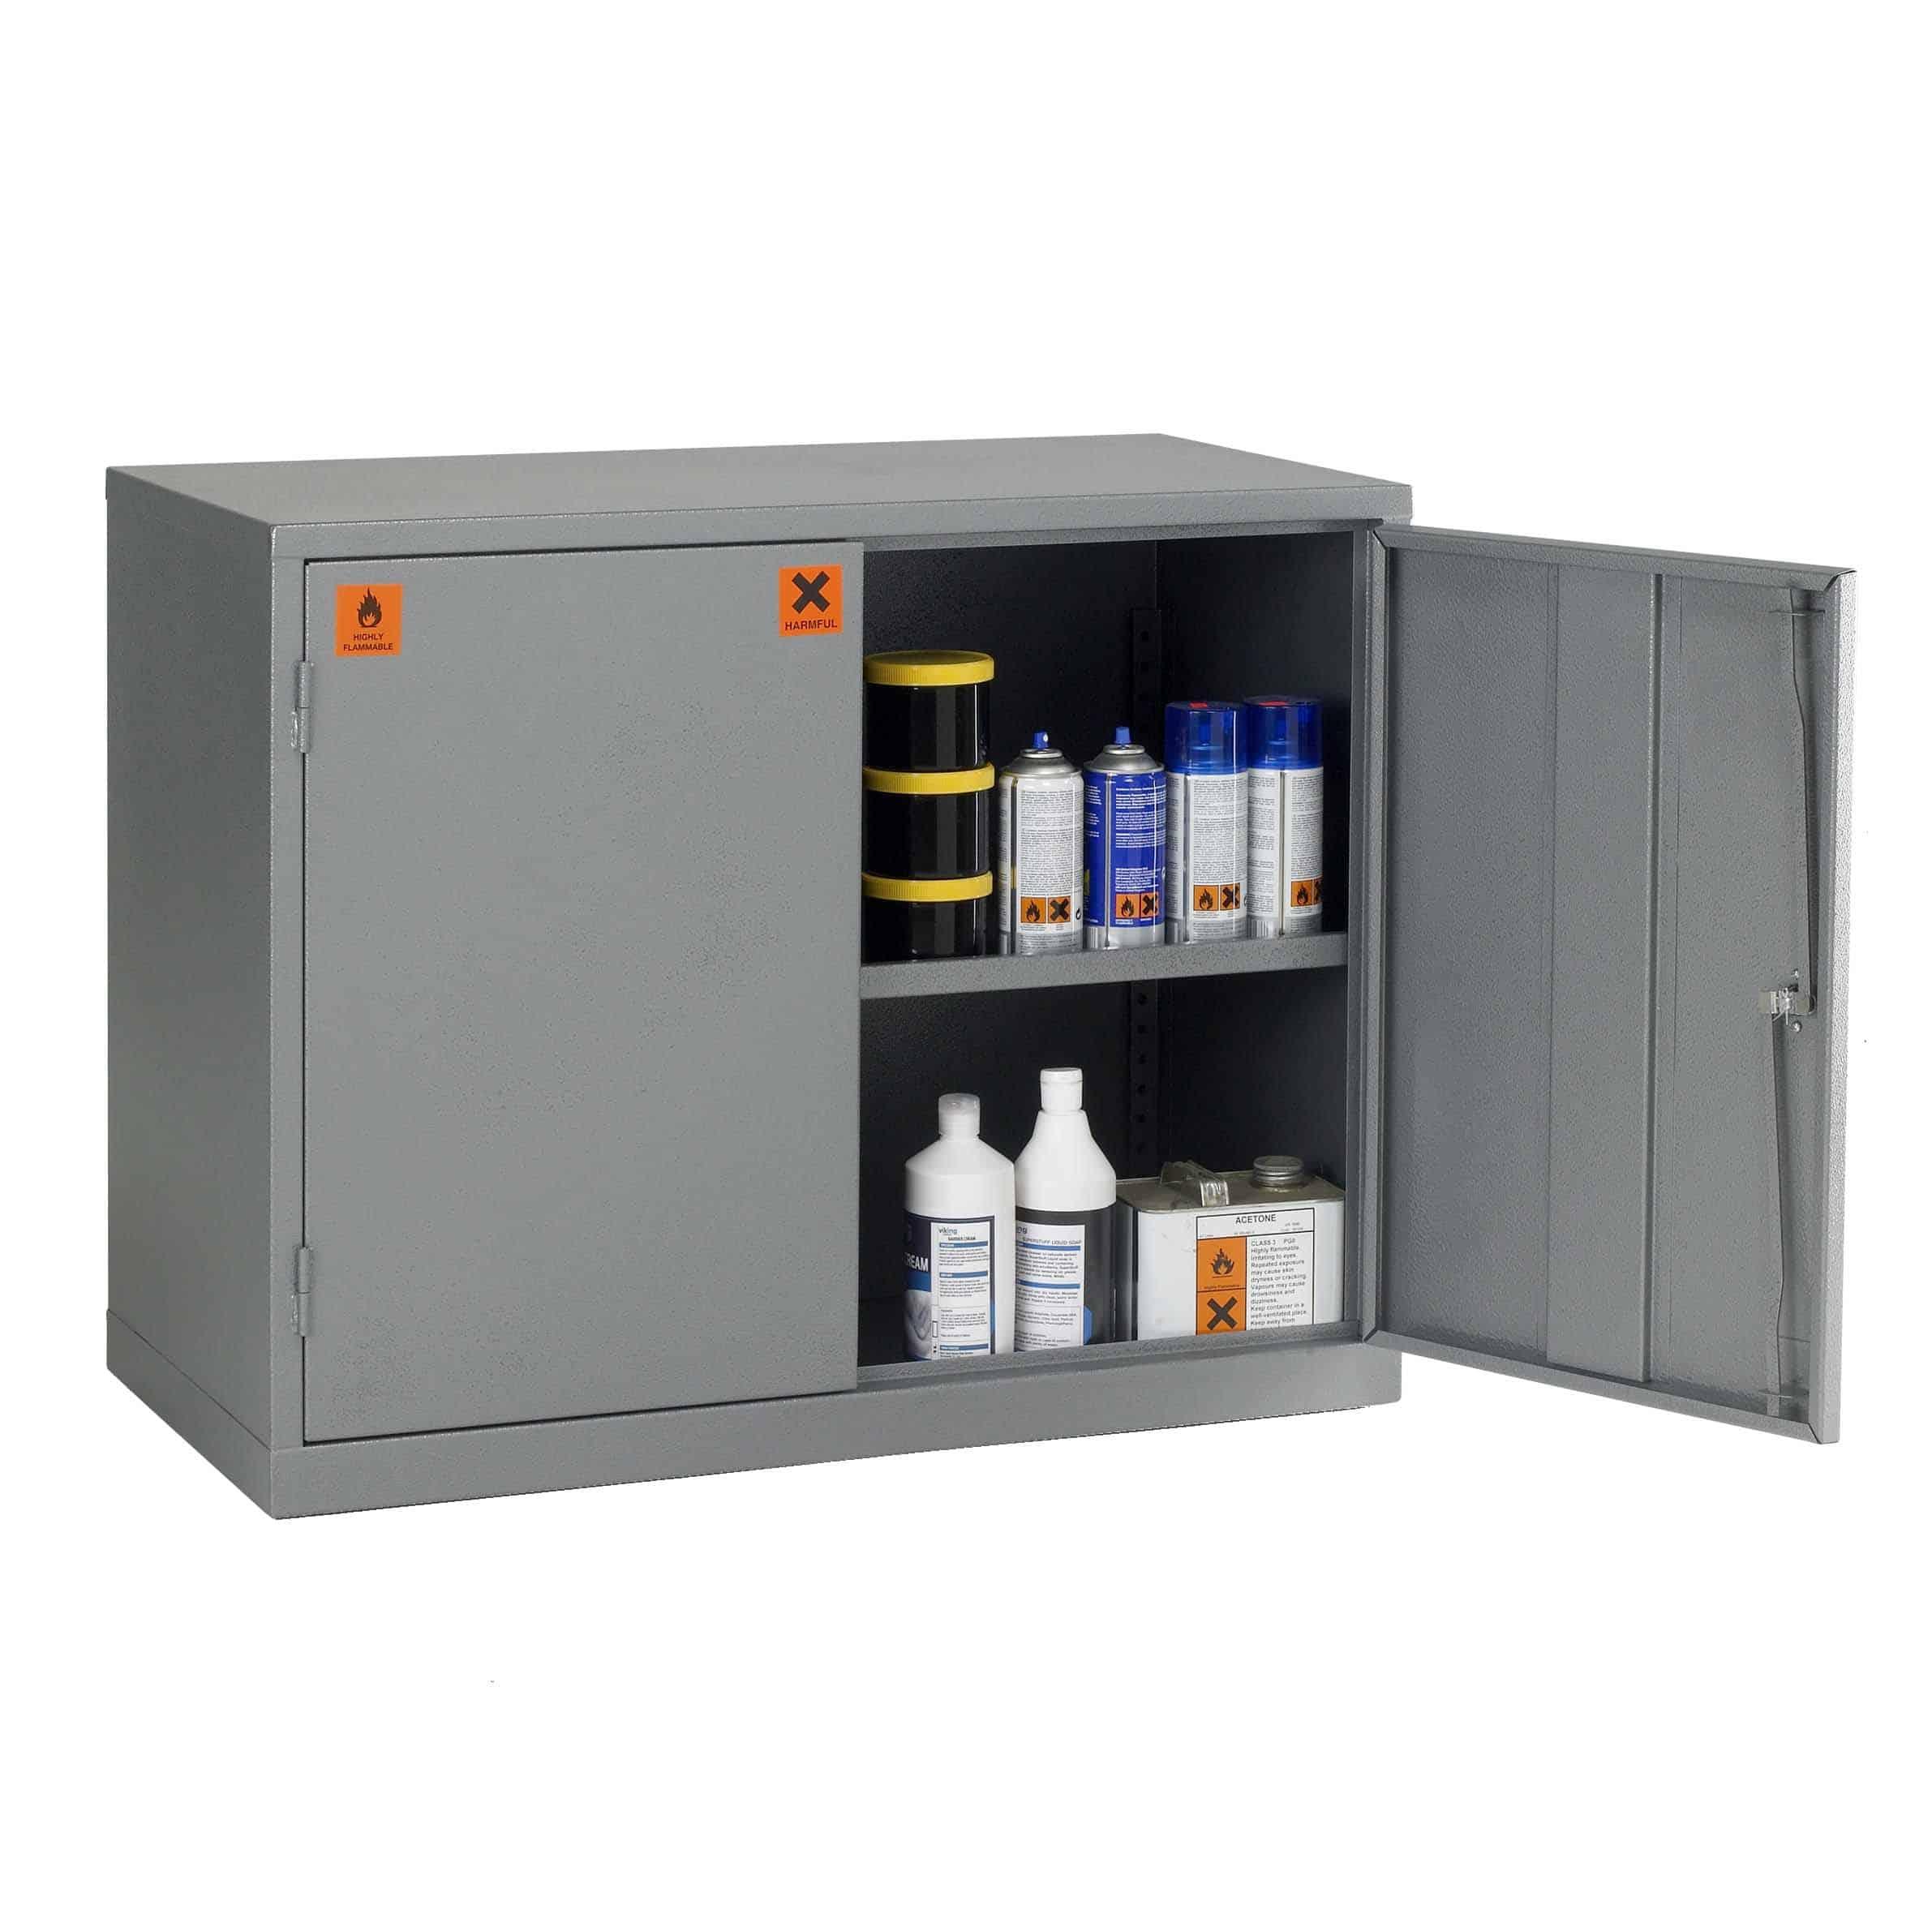 SU04C COSHH Storage Cabinets